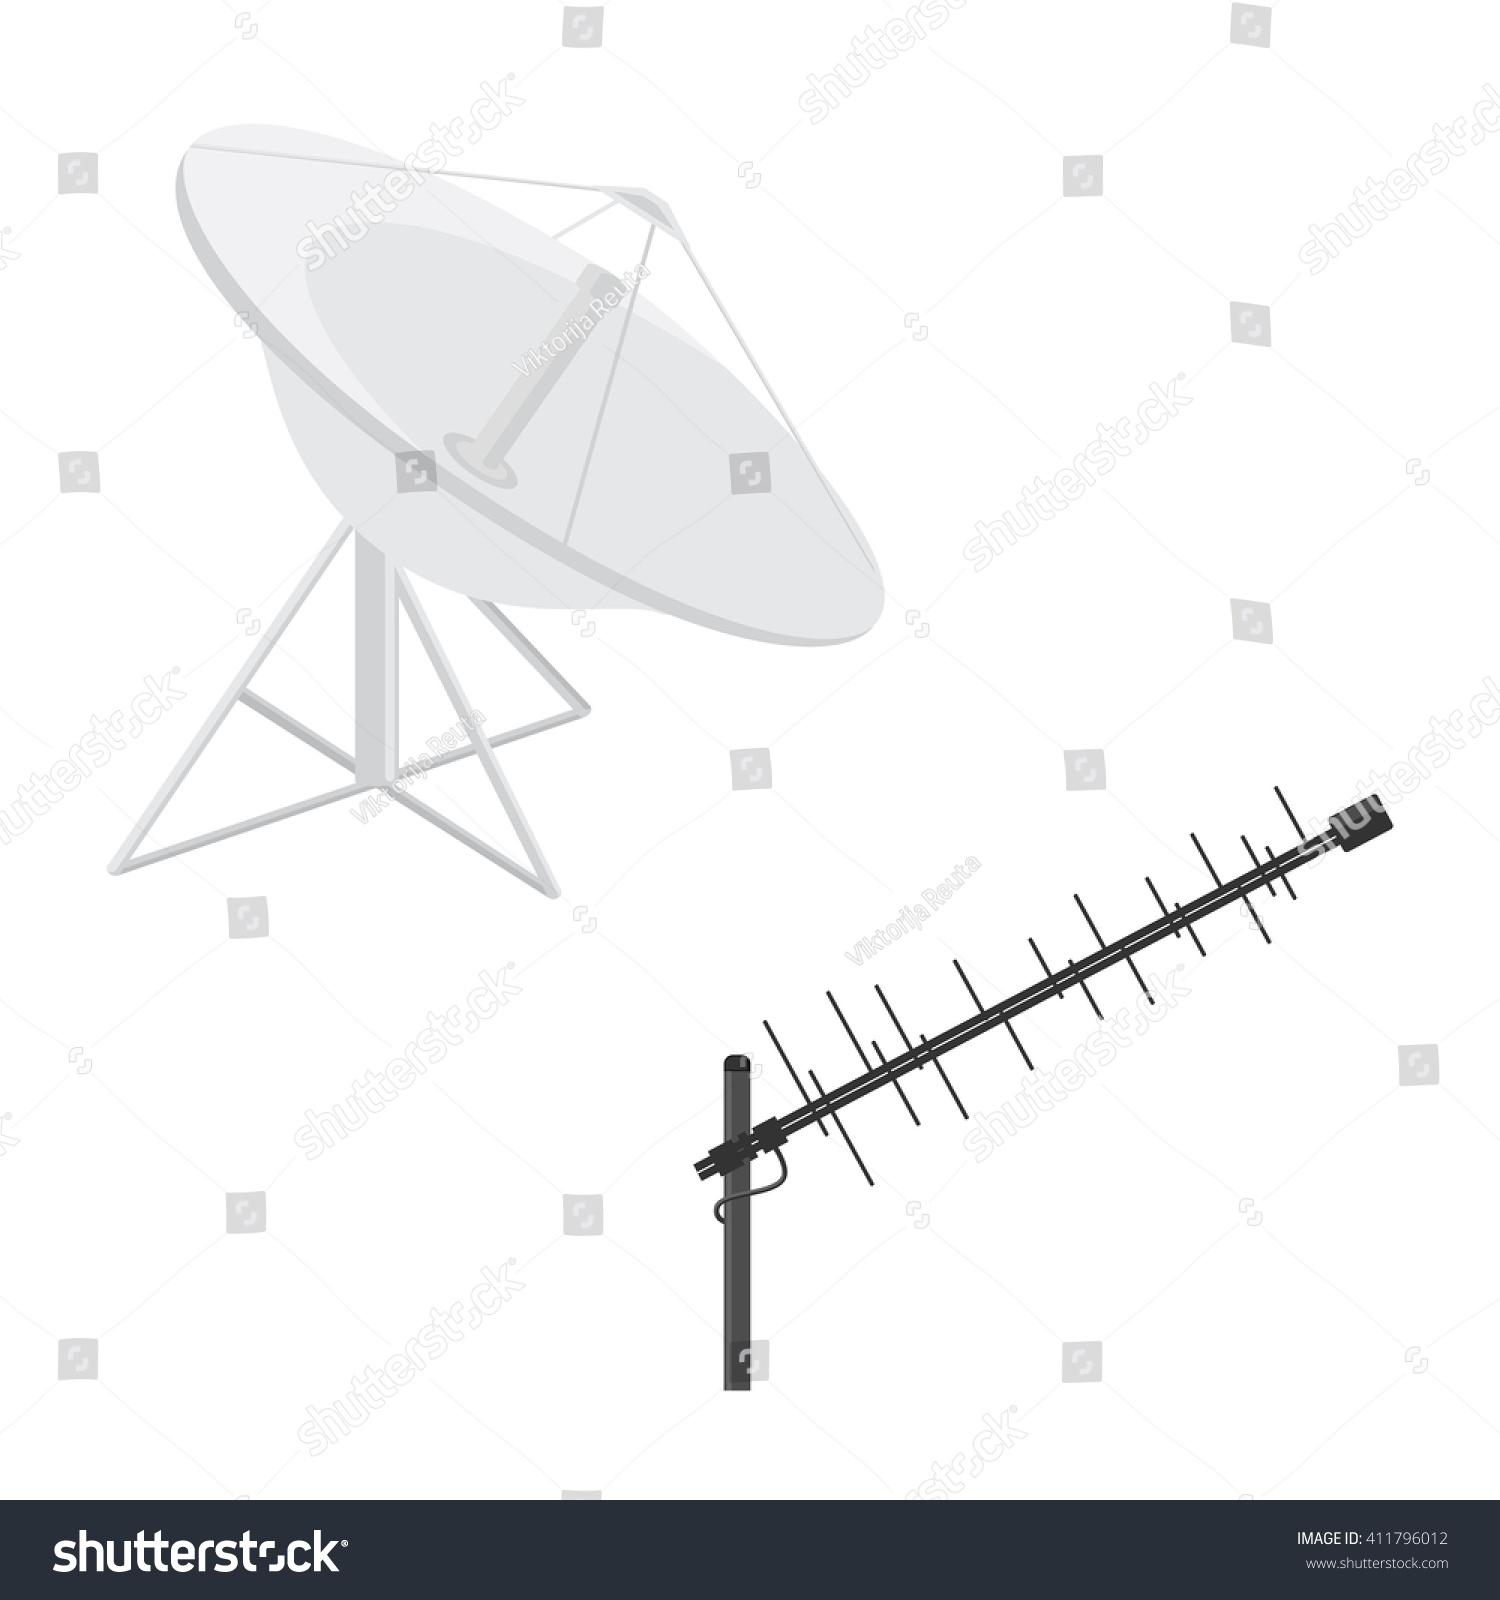 Vector Illustration Satellite Dish Antenna Television Stock Radar Tracking Aircraft Clip Wiring Circuit Diagram And Flat Icon